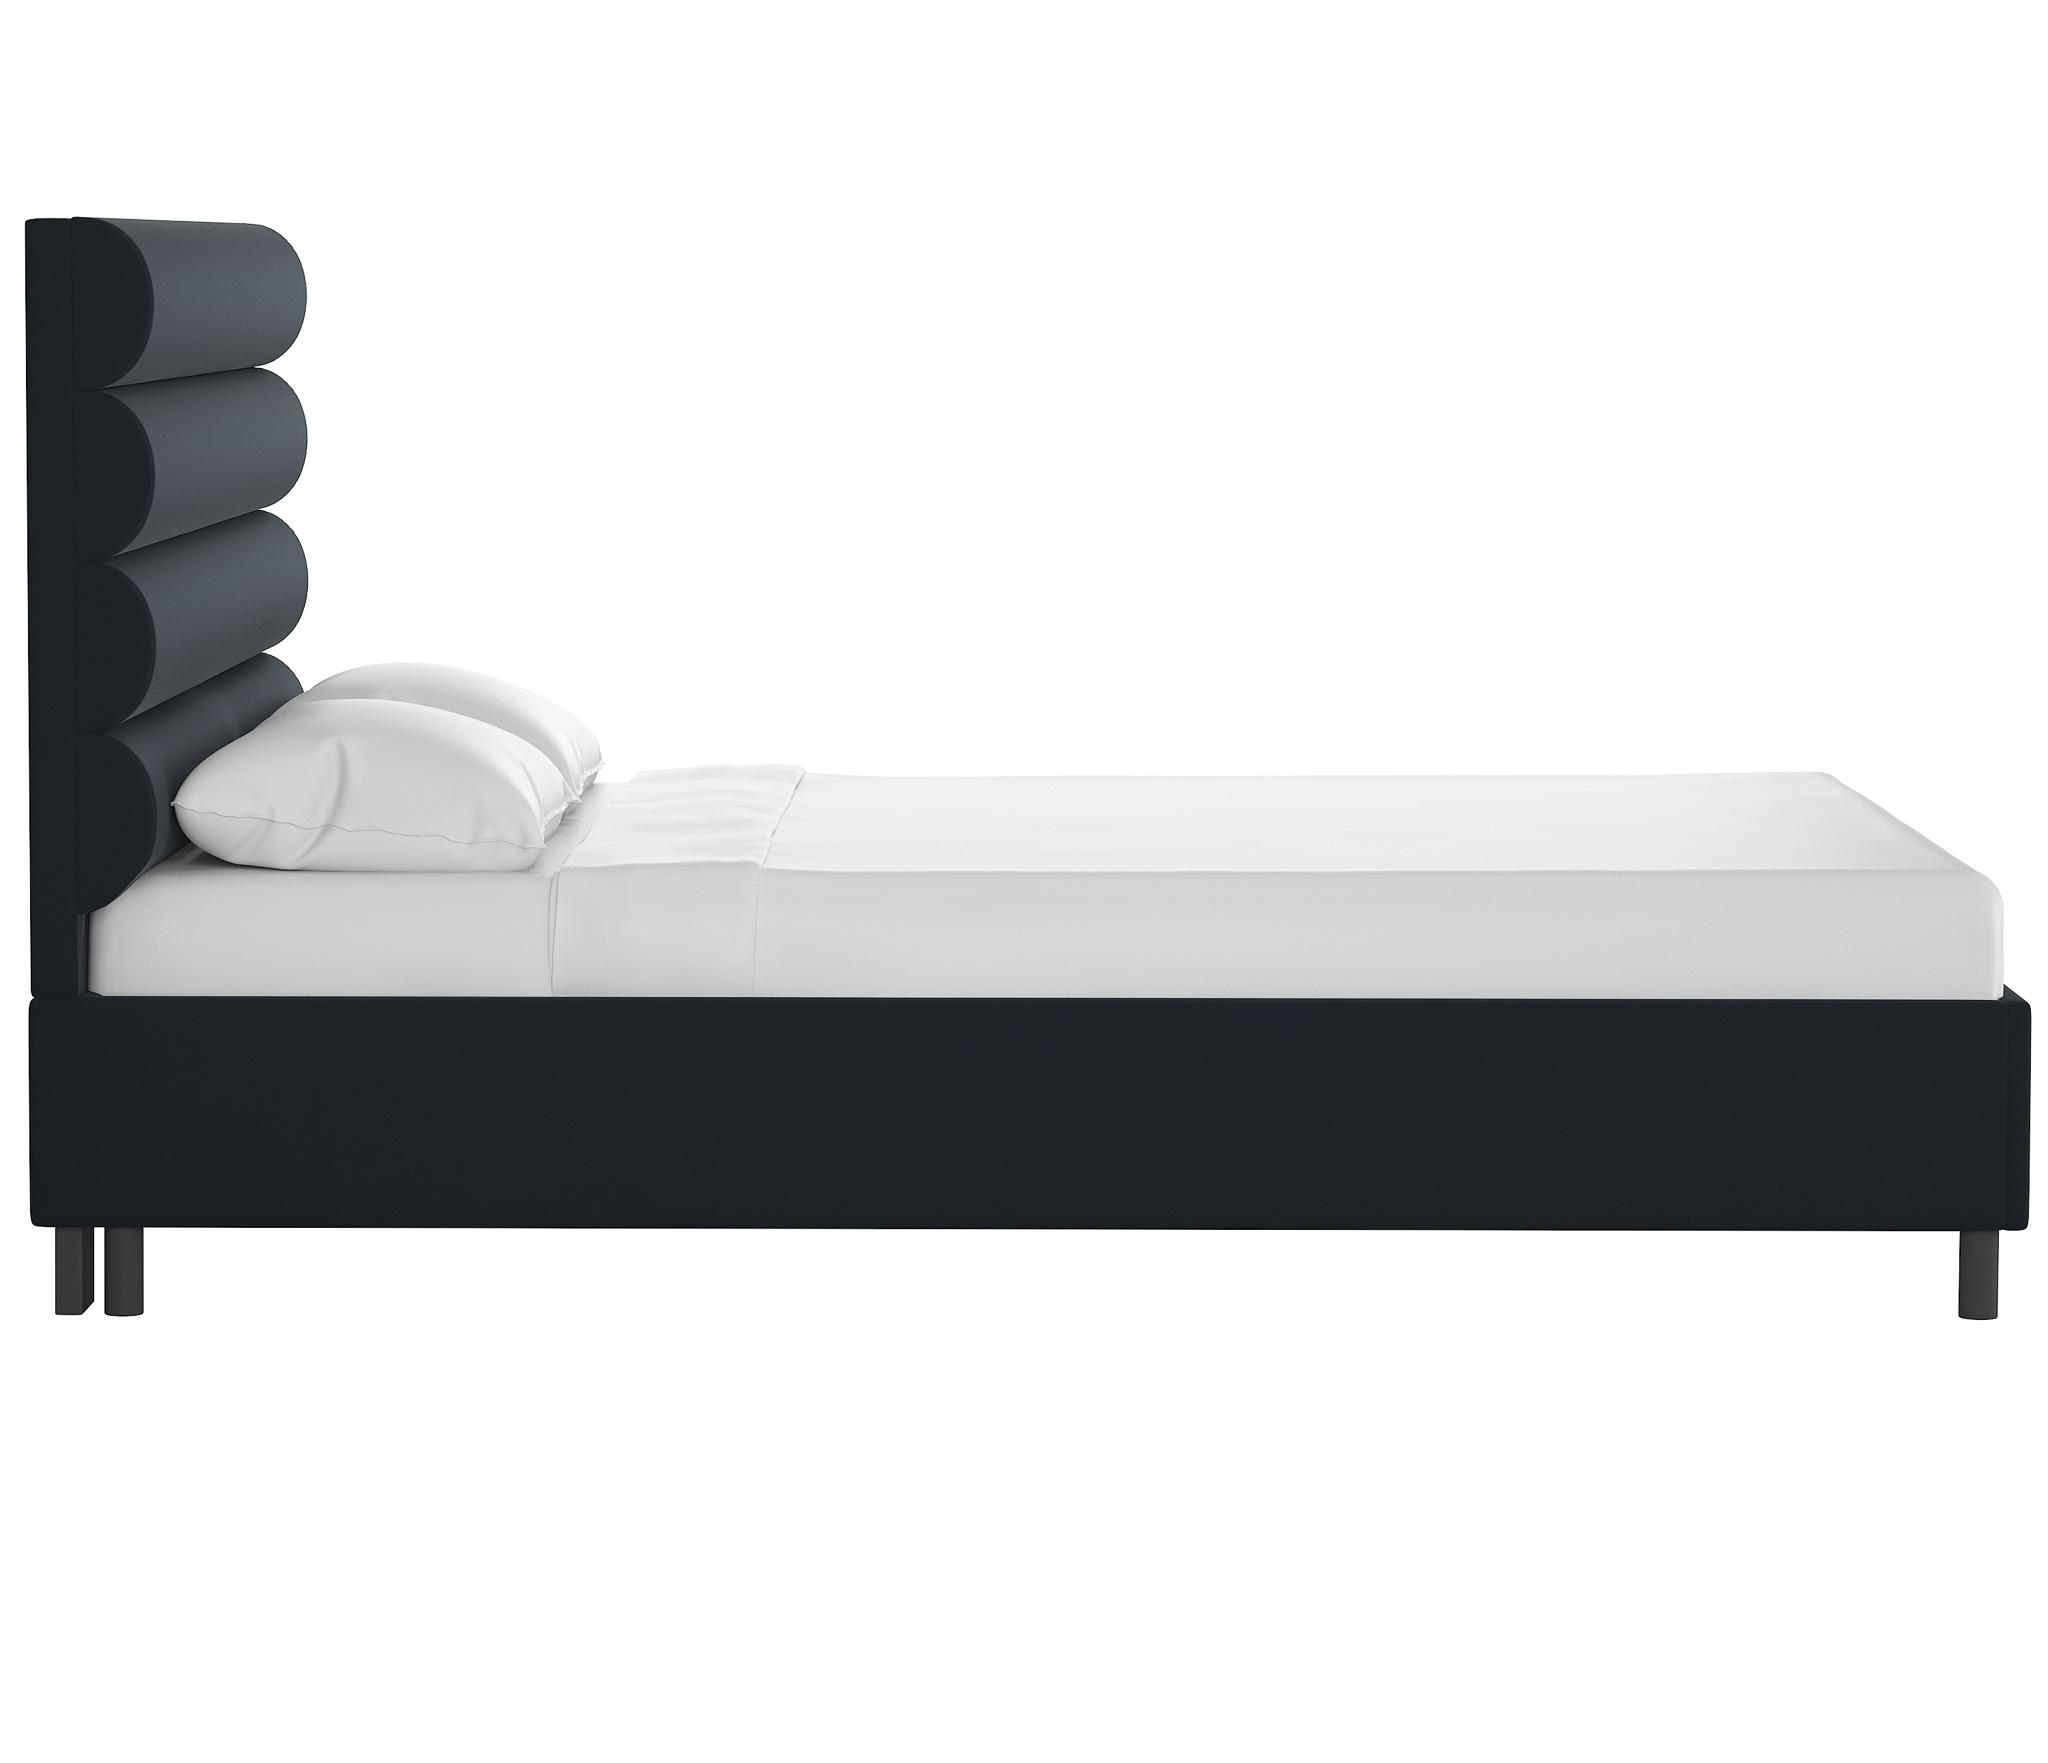 Bailee Channel Platform Bed, Navy King